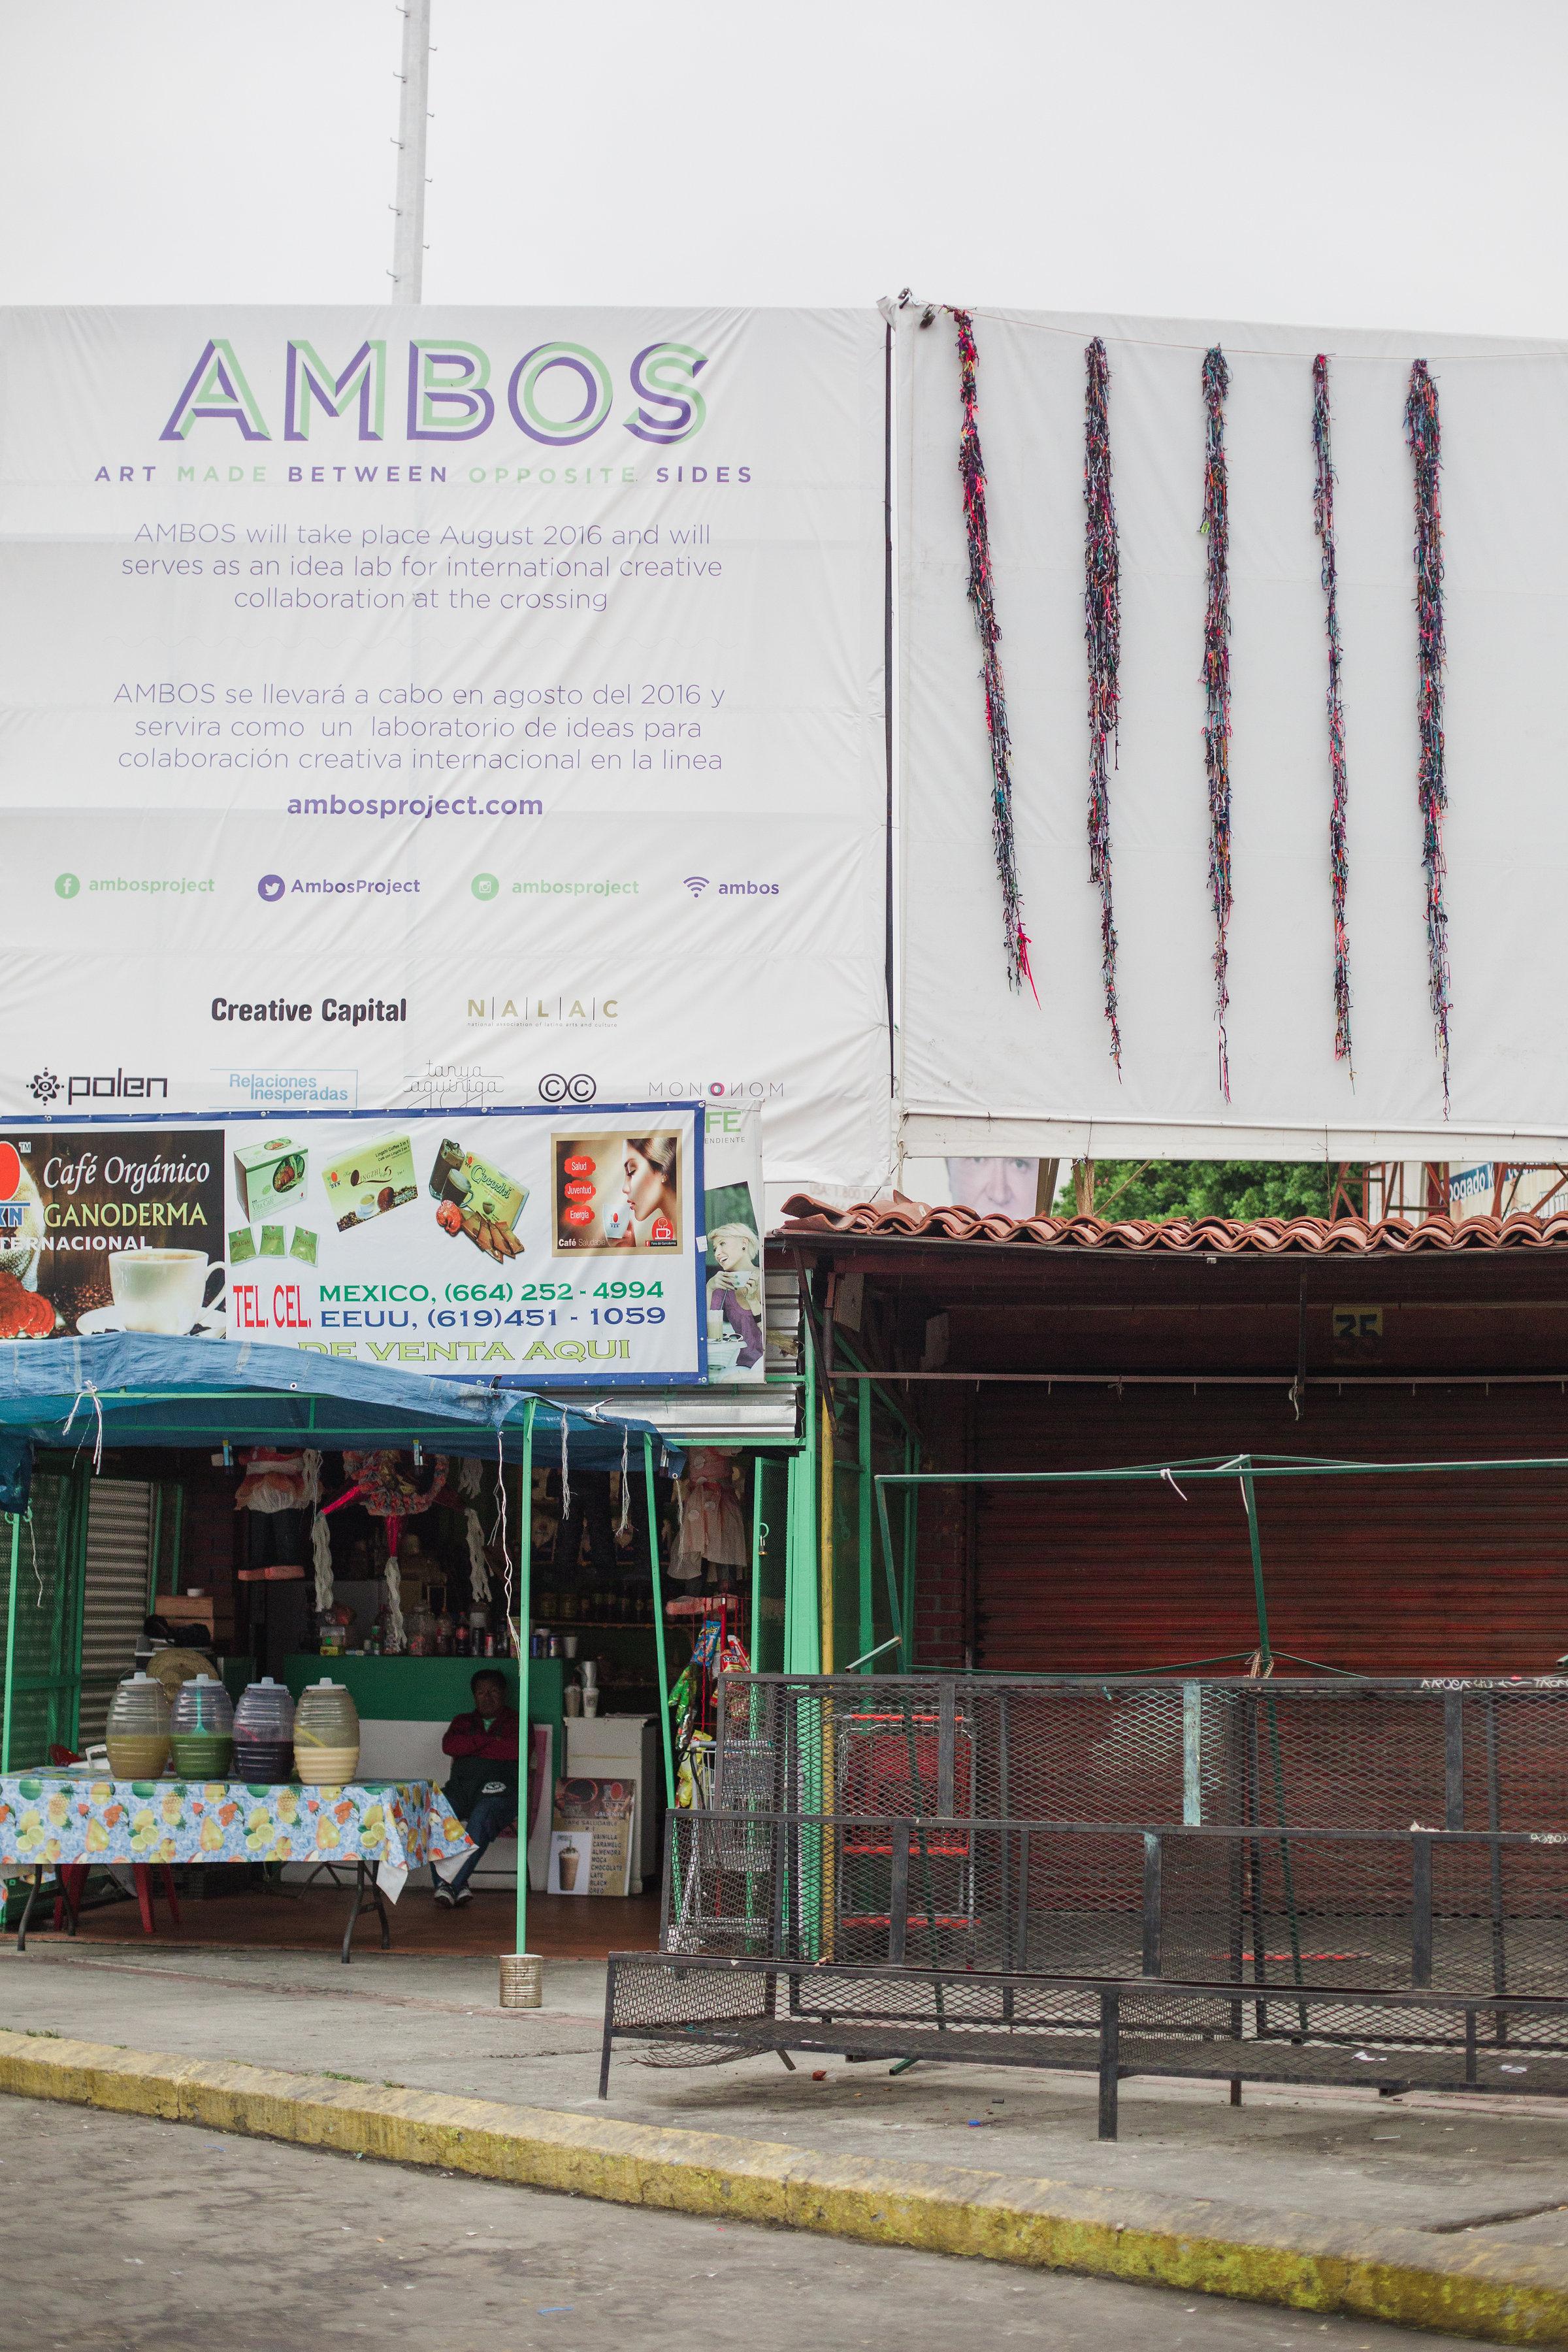 AMBOS-BorderQuipu-Day2-0009.jpg